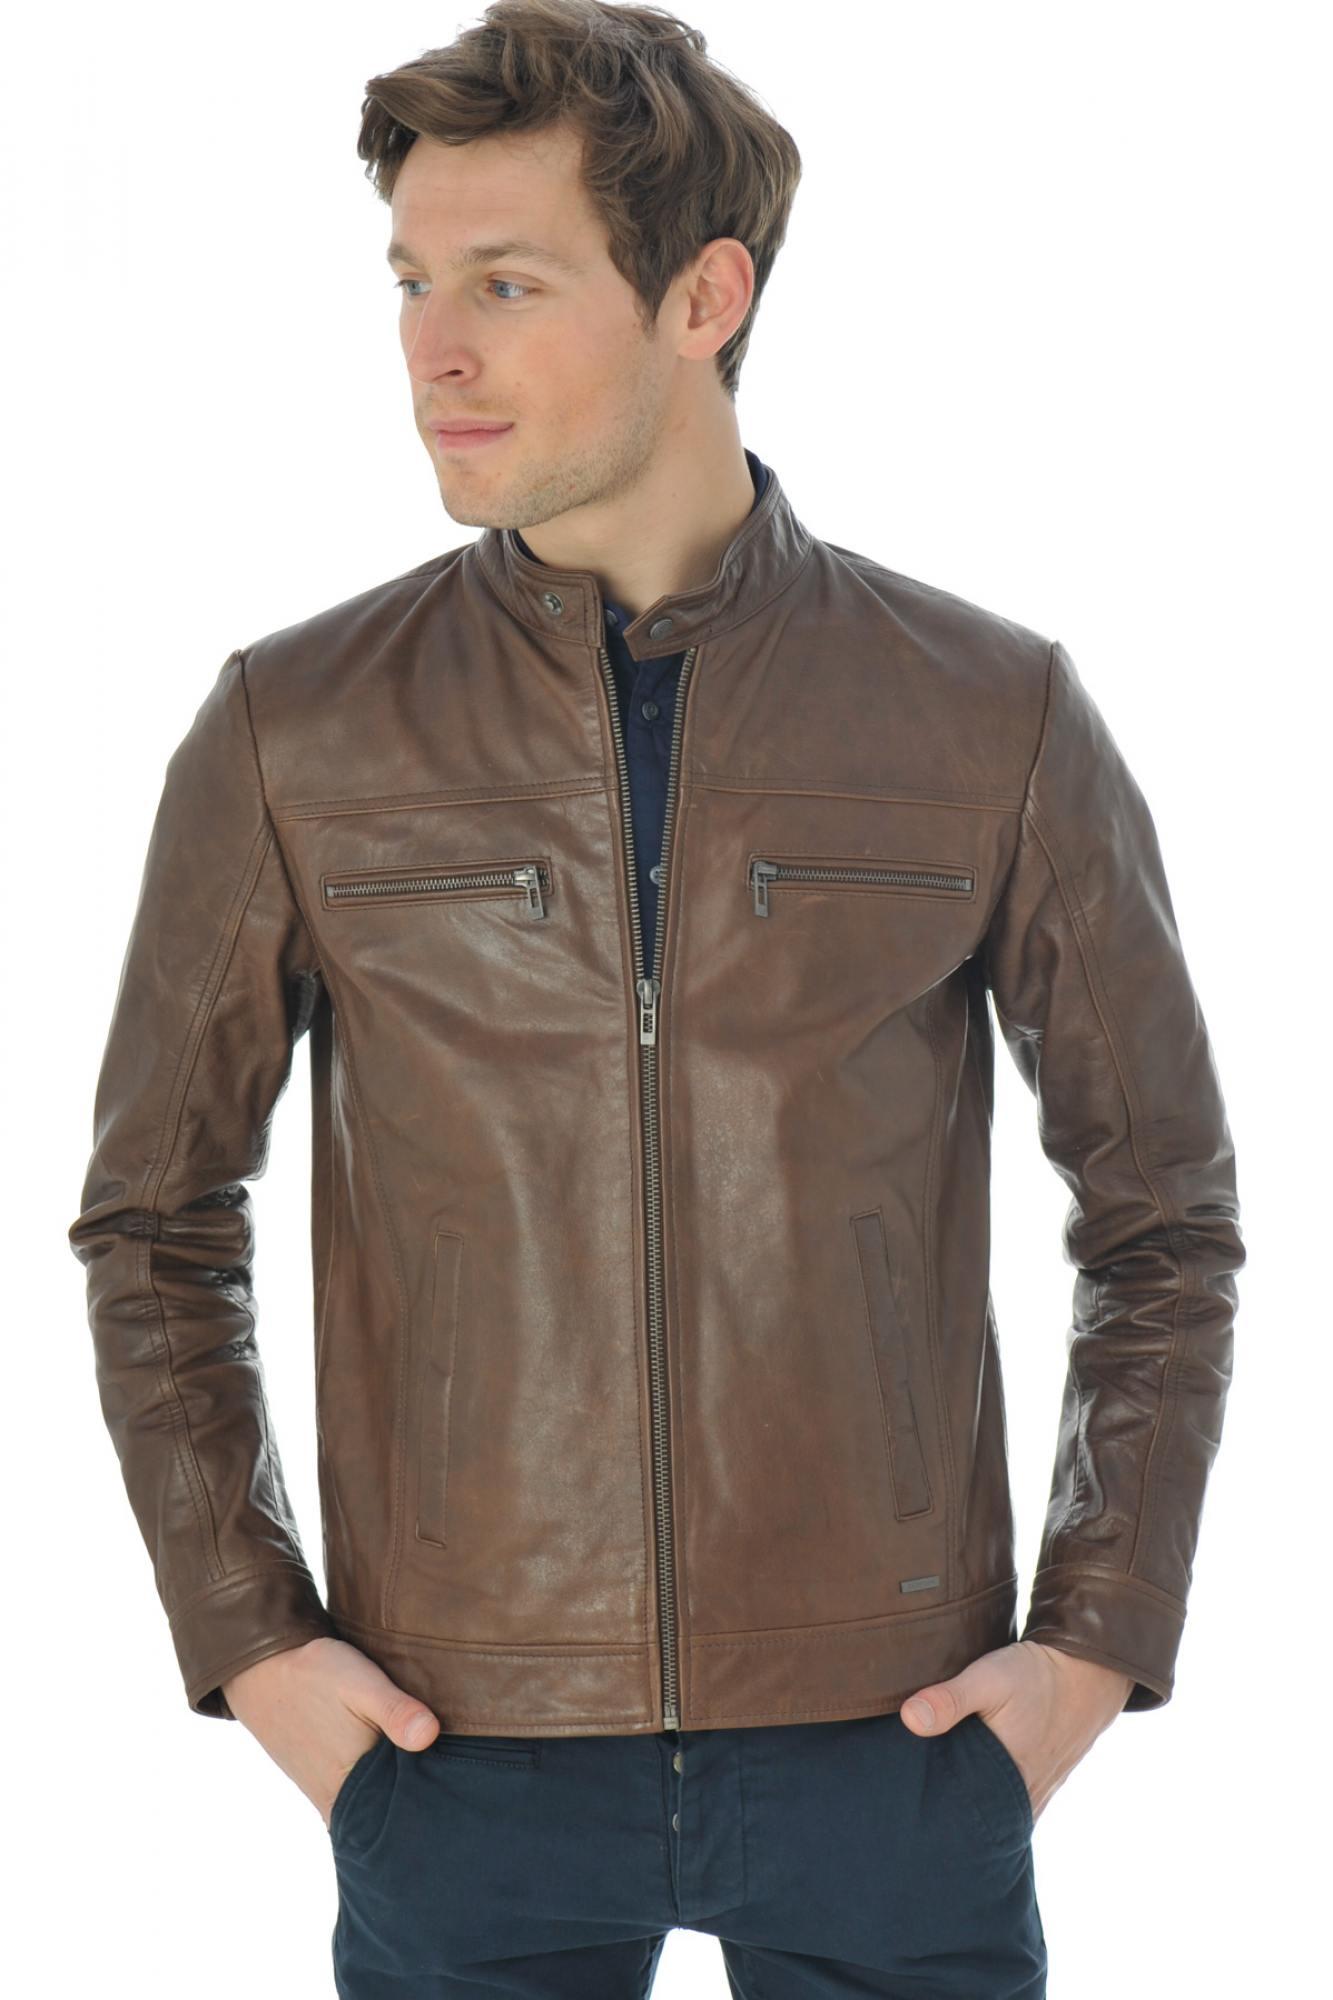 Blousons en cuir Cityzen Leather Atlanta cognac Blousons